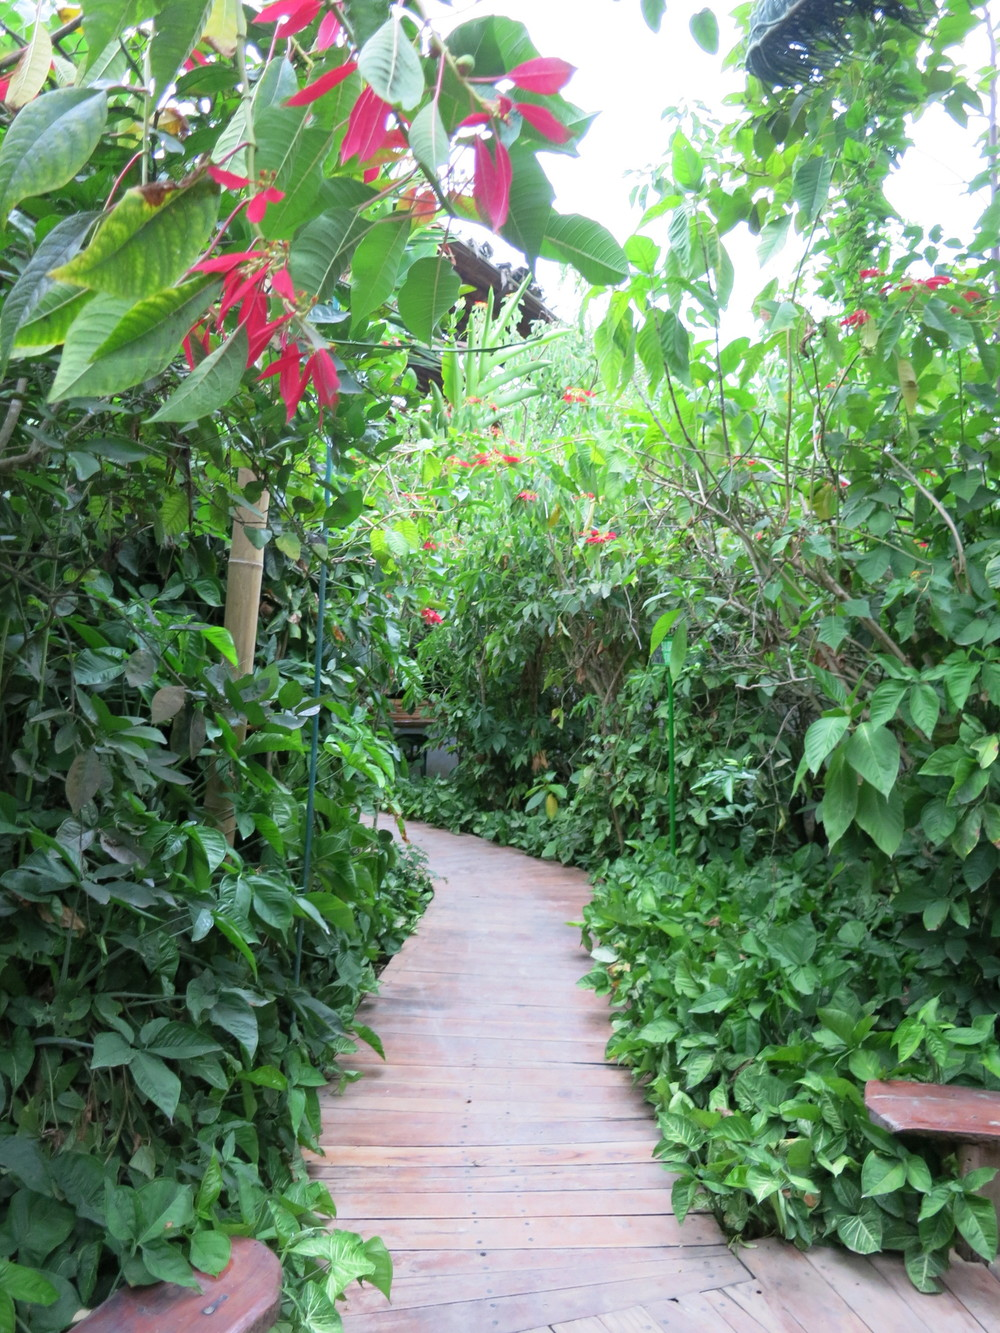 Pathways around the hosteria